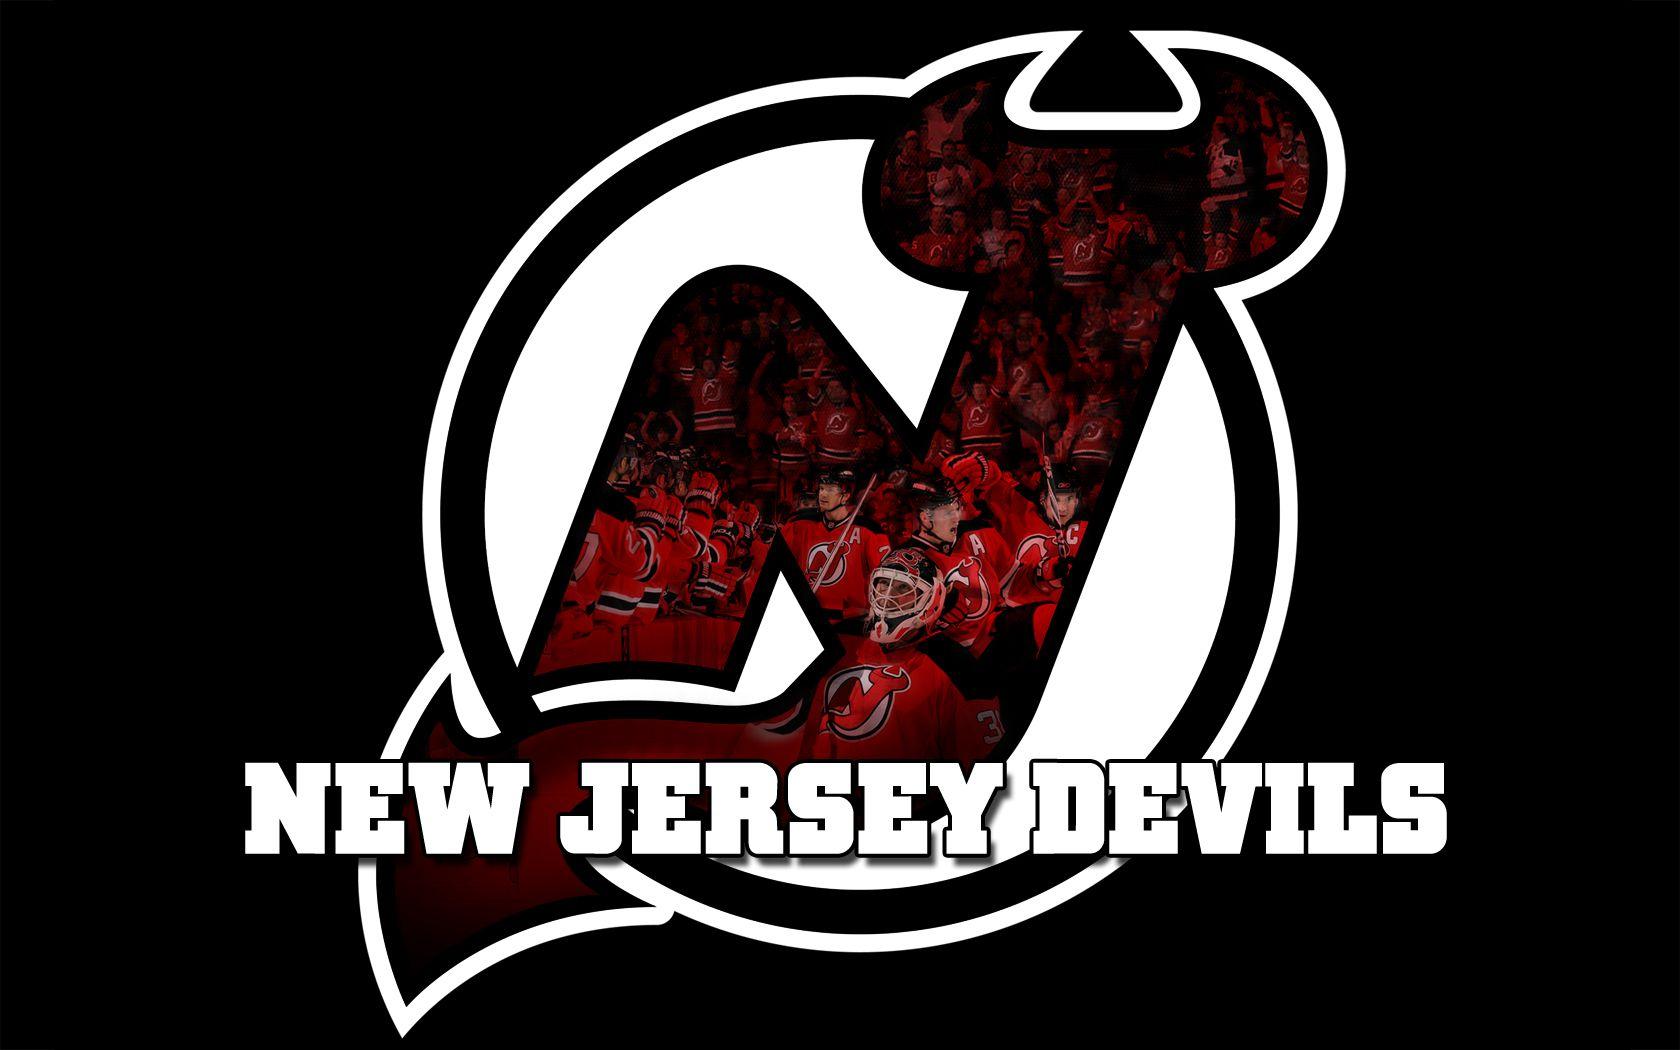 New Jersey Devils Logo - Nj Devils Iphone X , HD Wallpaper & Backgrounds